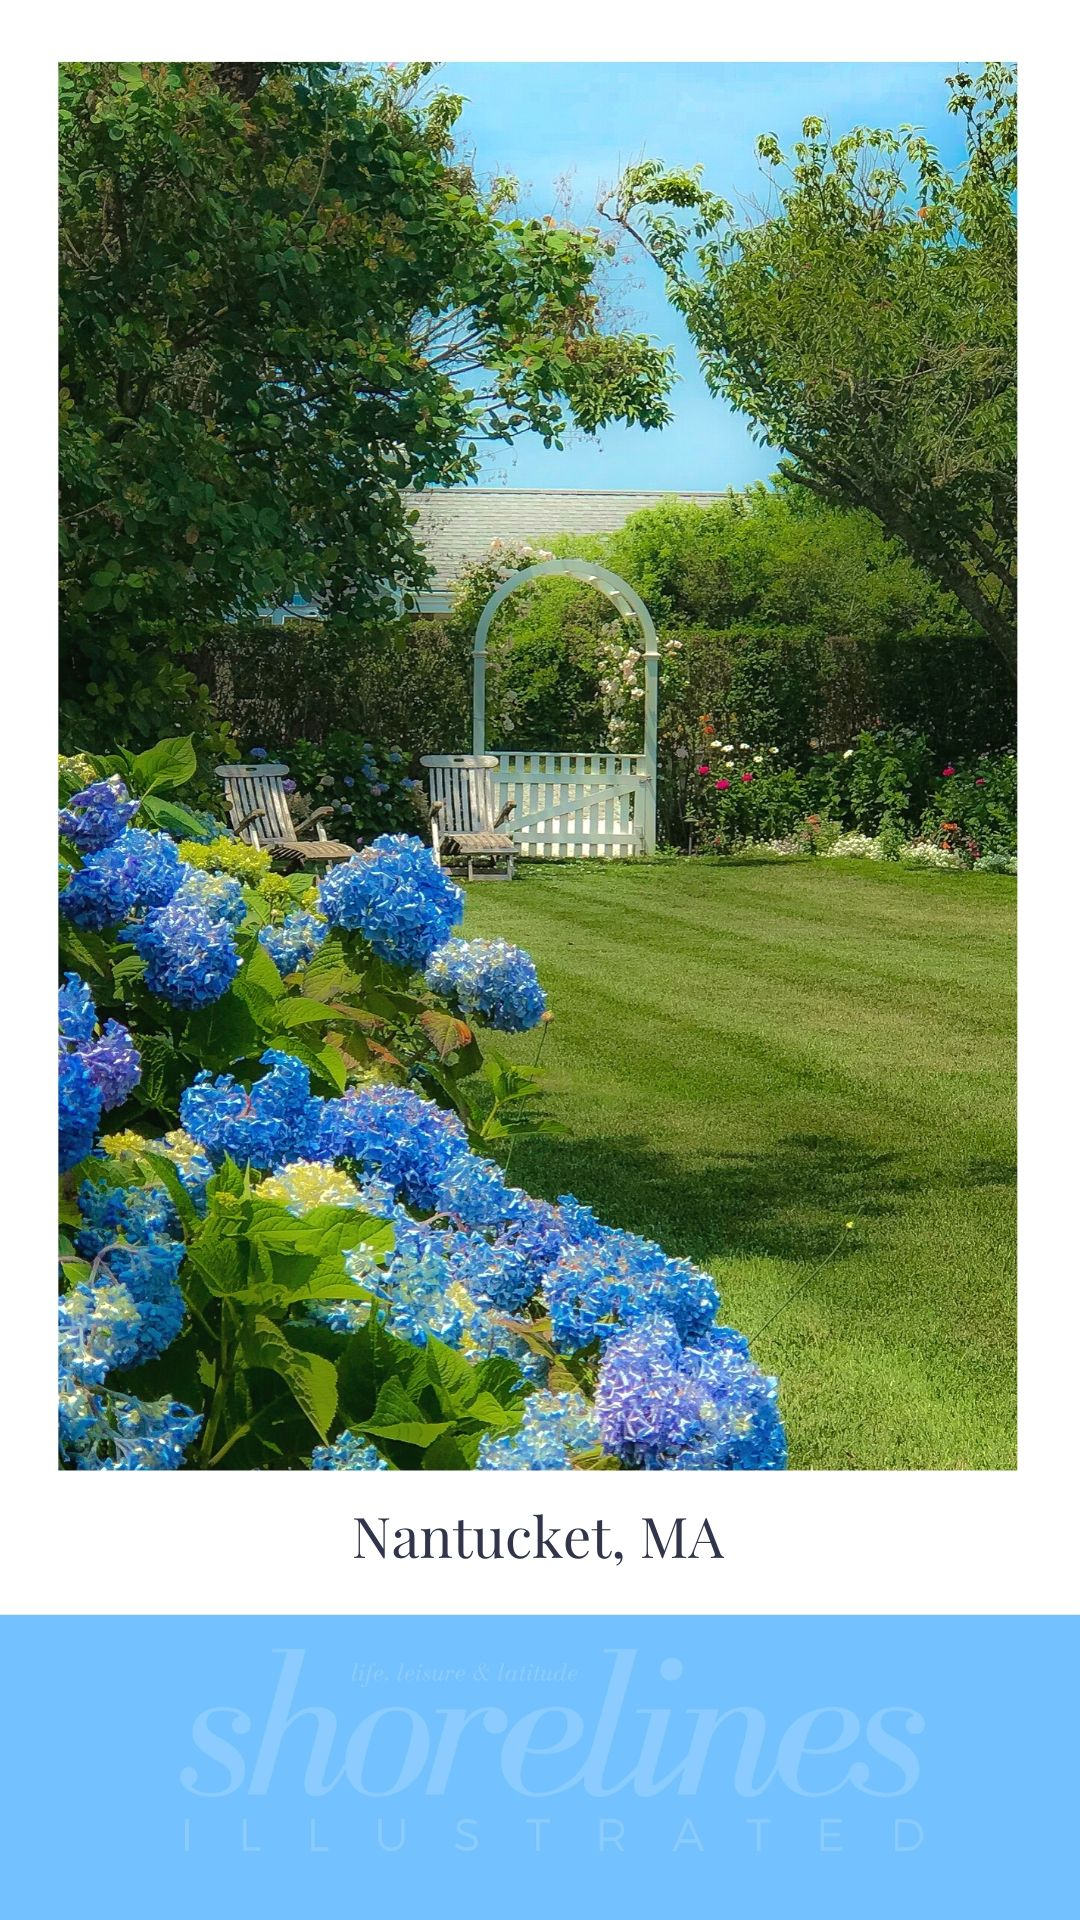 Blue Hydrangeas of New England-18